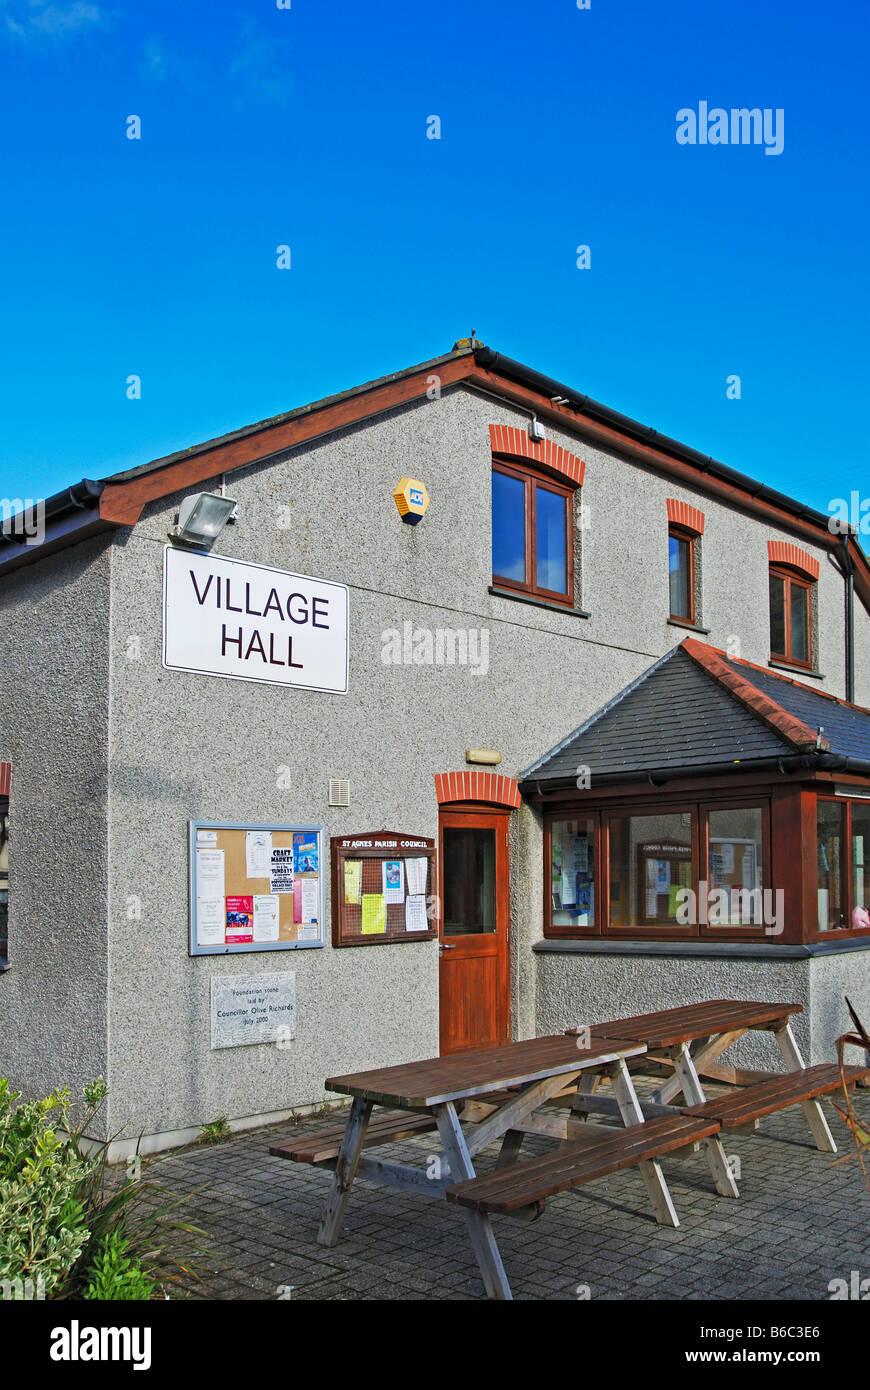 the village hall at porthtowan,cornwall,uk - Stock Image